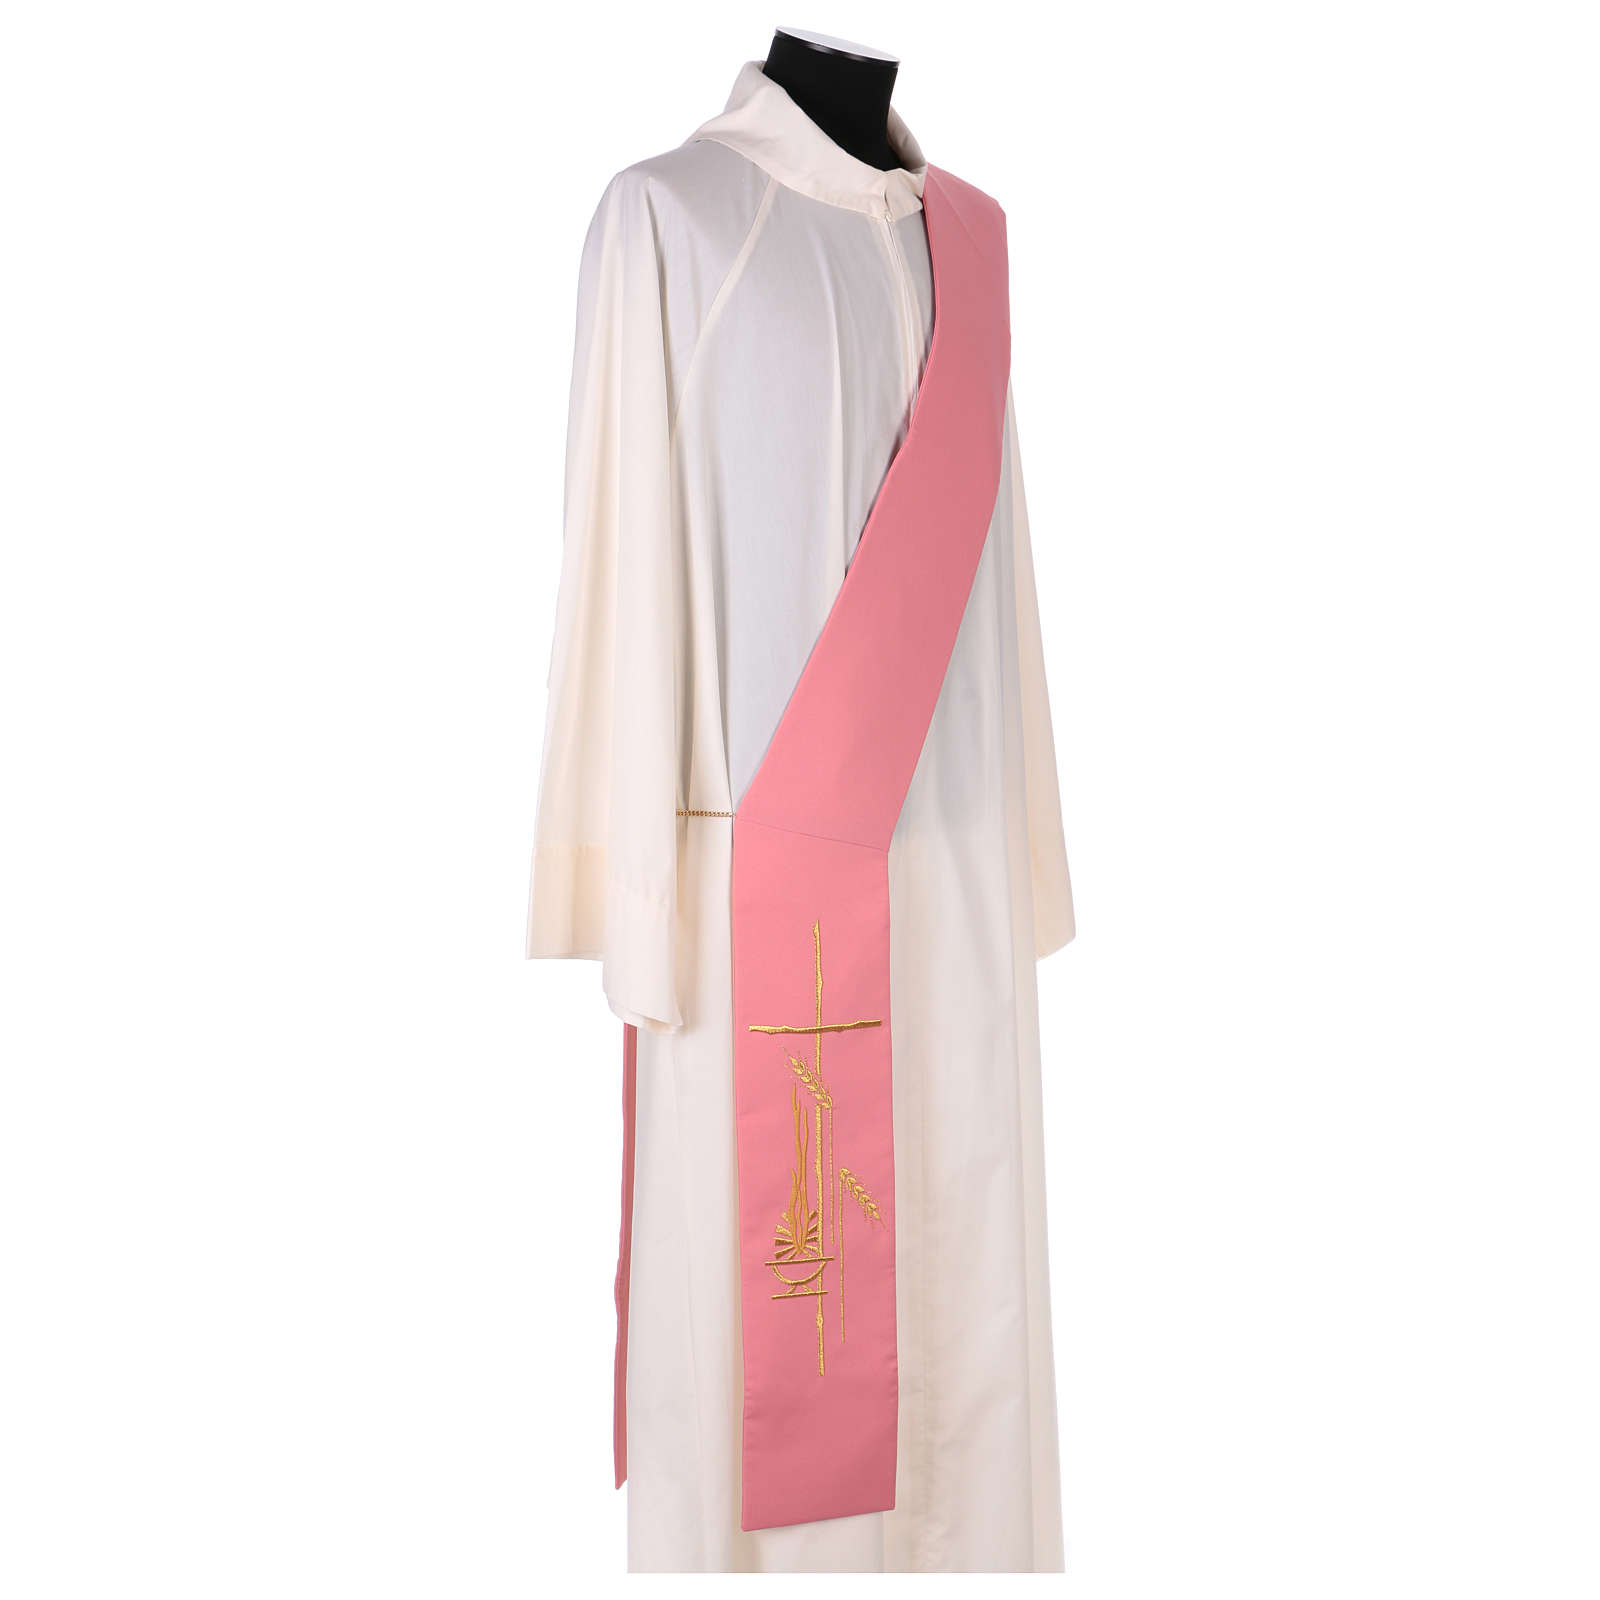 Estola diaconal rosa 100% poliéster lámpara cruz 4